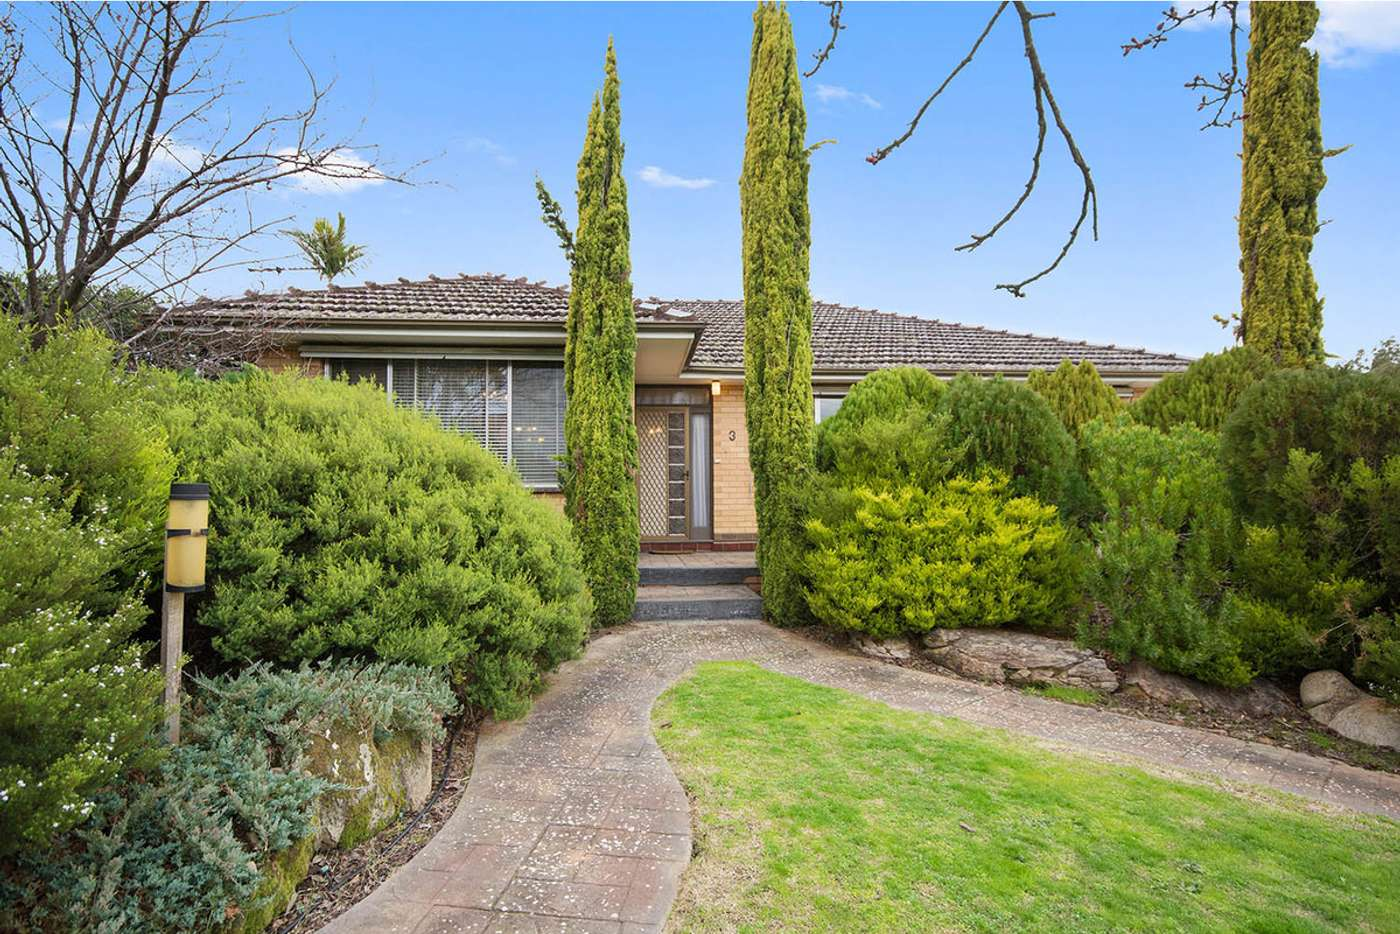 Main view of Homely house listing, 3 Walnut Grove, Dernancourt SA 5075